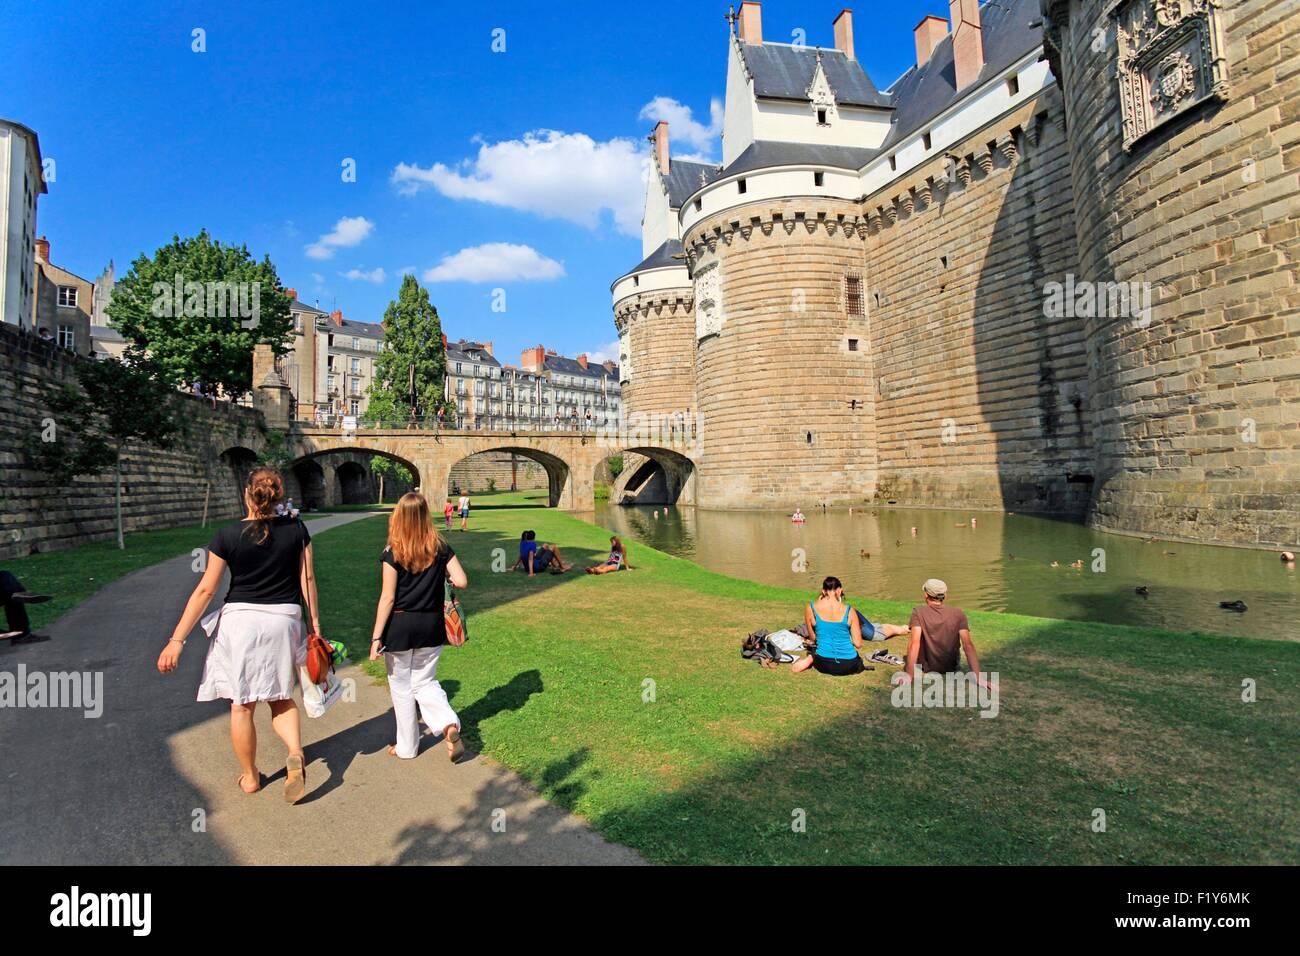 France, Loire Atlantique, Nantes, The moats of the Castle of Dukes de Bretagne in Nantes views since the street - Stock Image